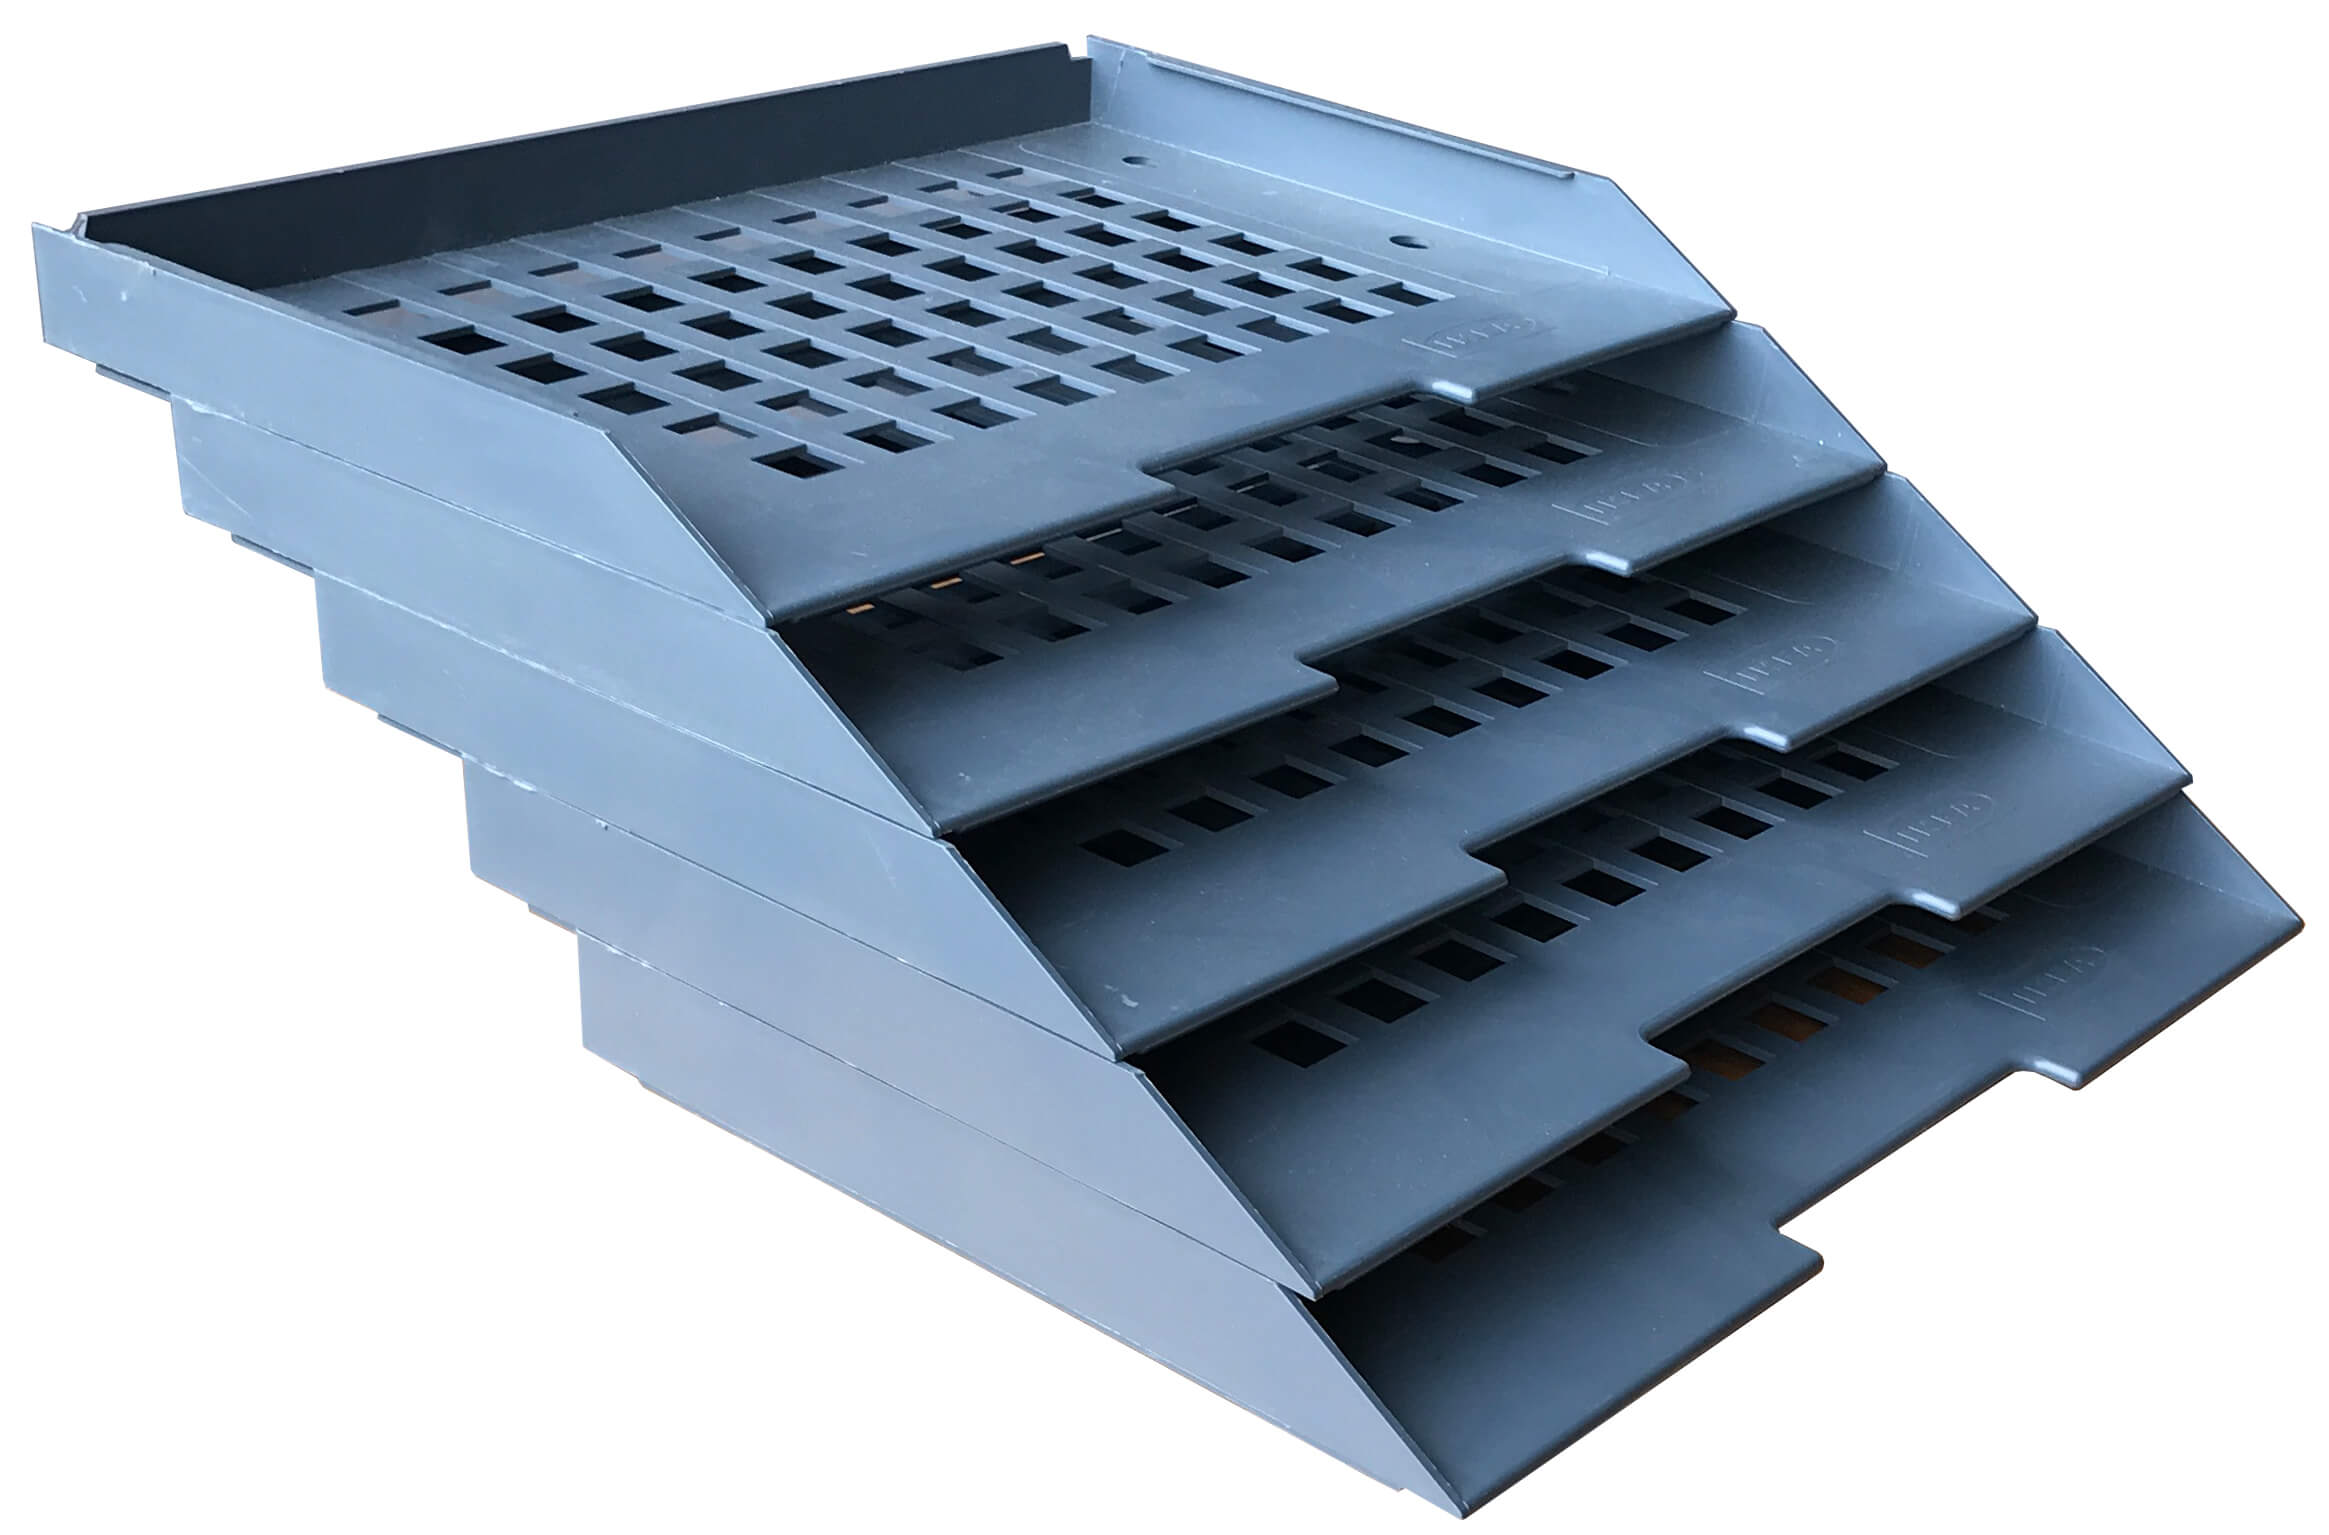 Ikea Schubladeneinsatz ikea schubladeneinsatz für ikea effektiv rollcontainer 220146566